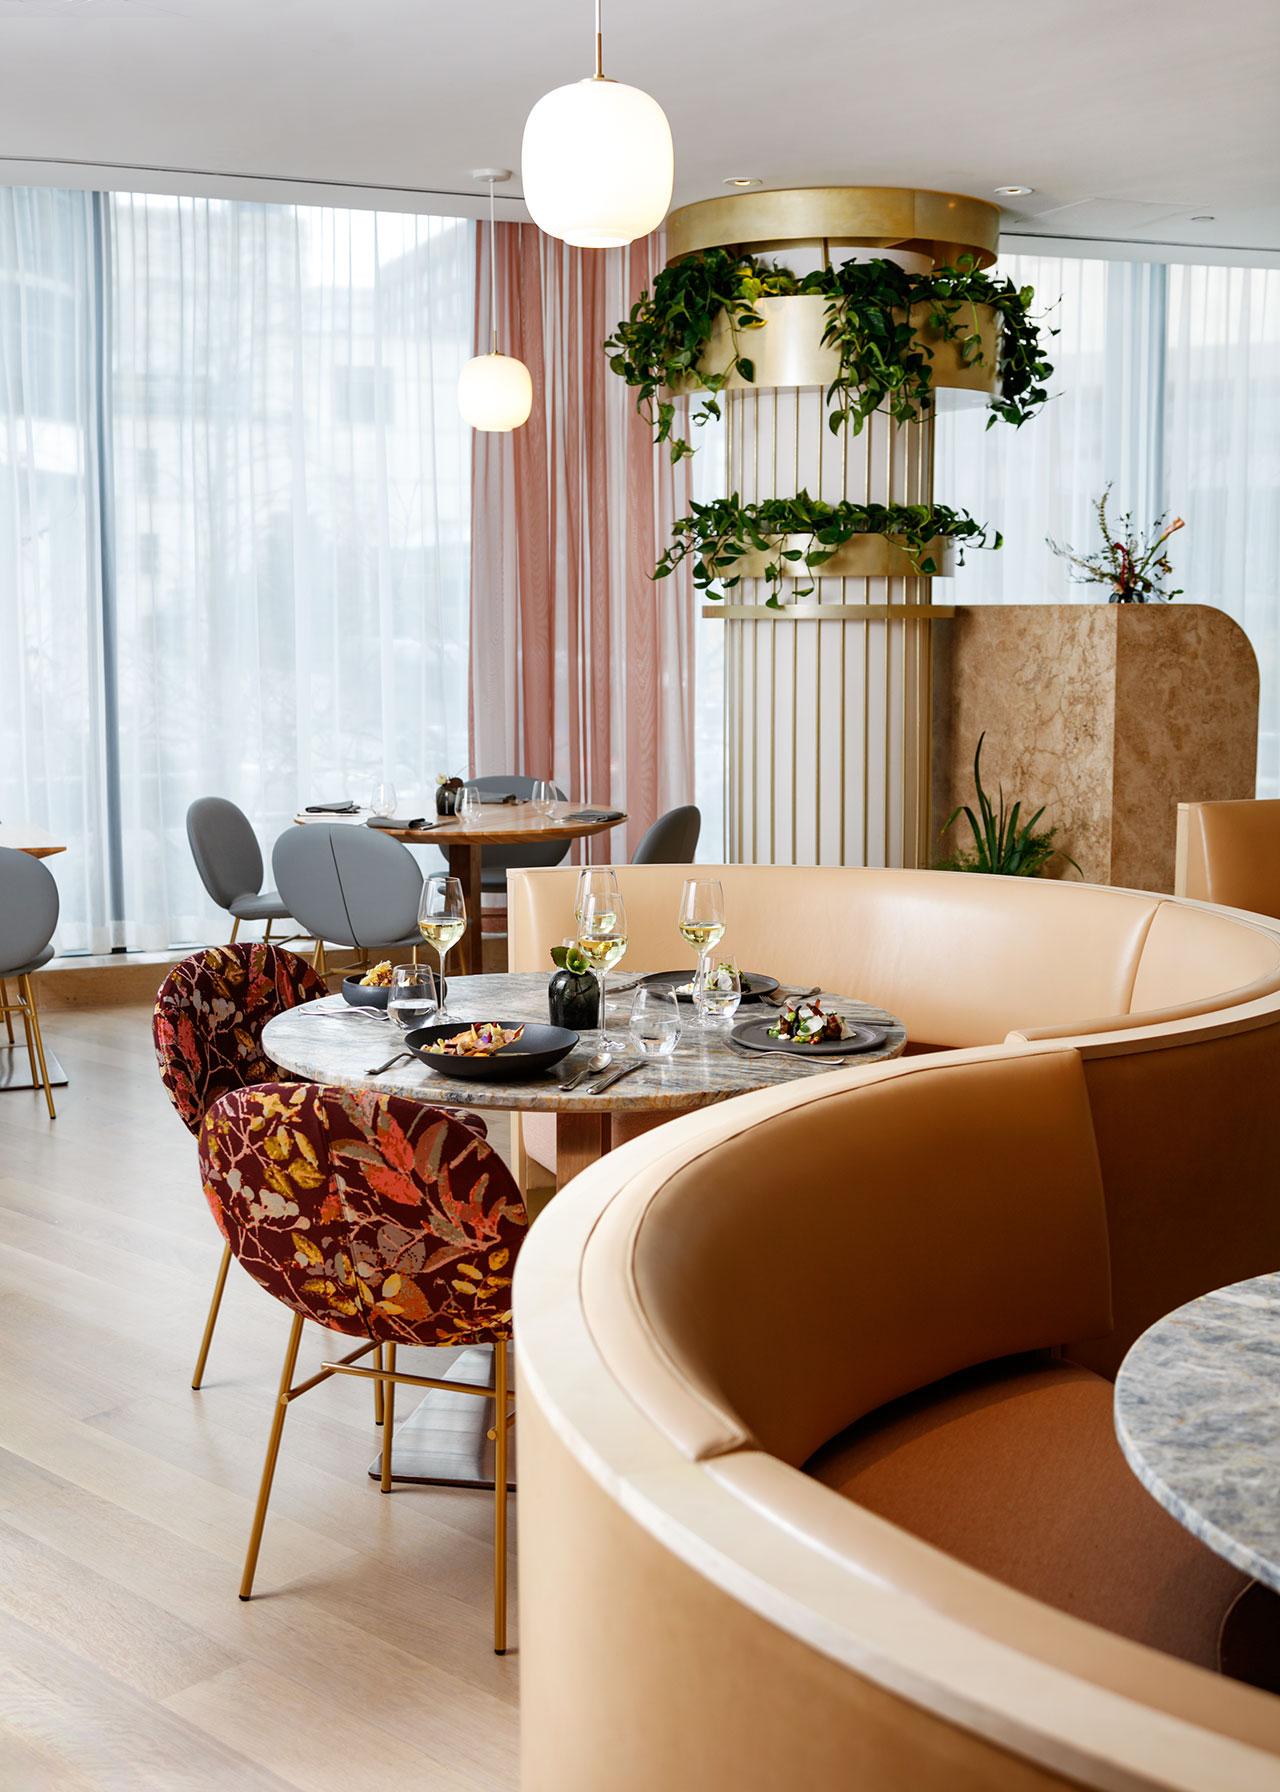 A Mid-Century Modern Restaurant with A Botanical Inspiration 4